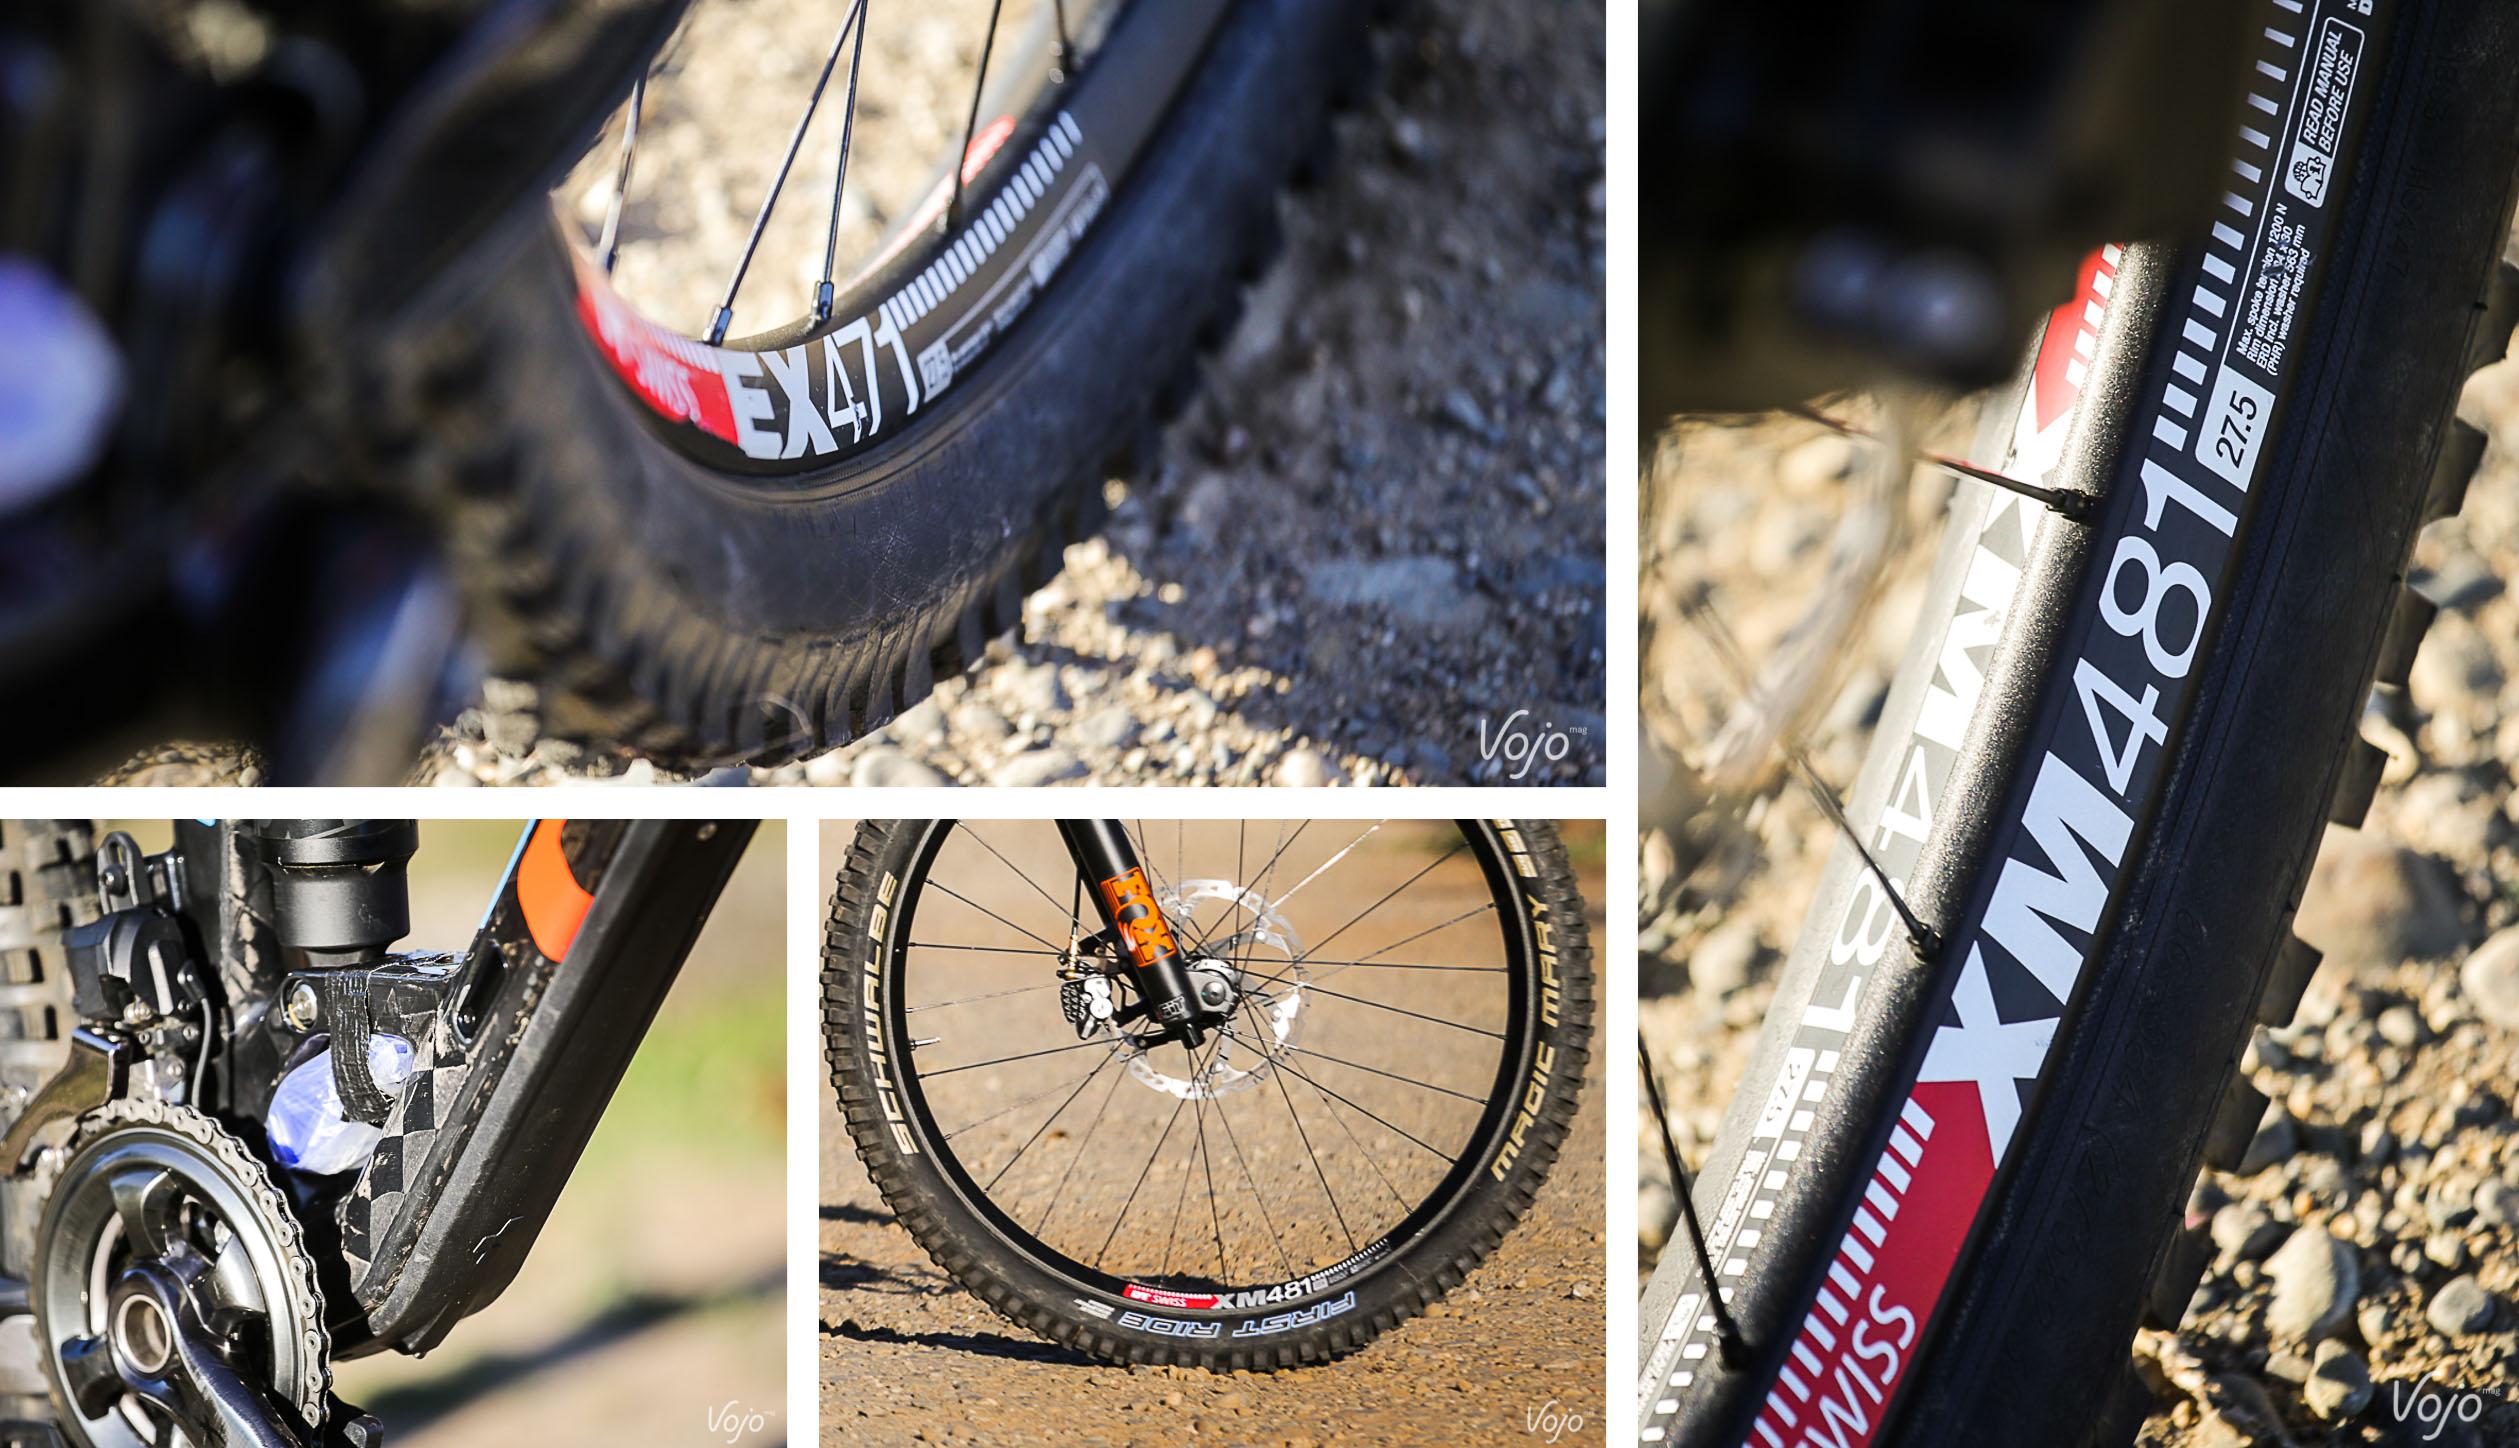 9-Bike_Check_EWS_2016_Copyright_Reuiller_Vojomag-1